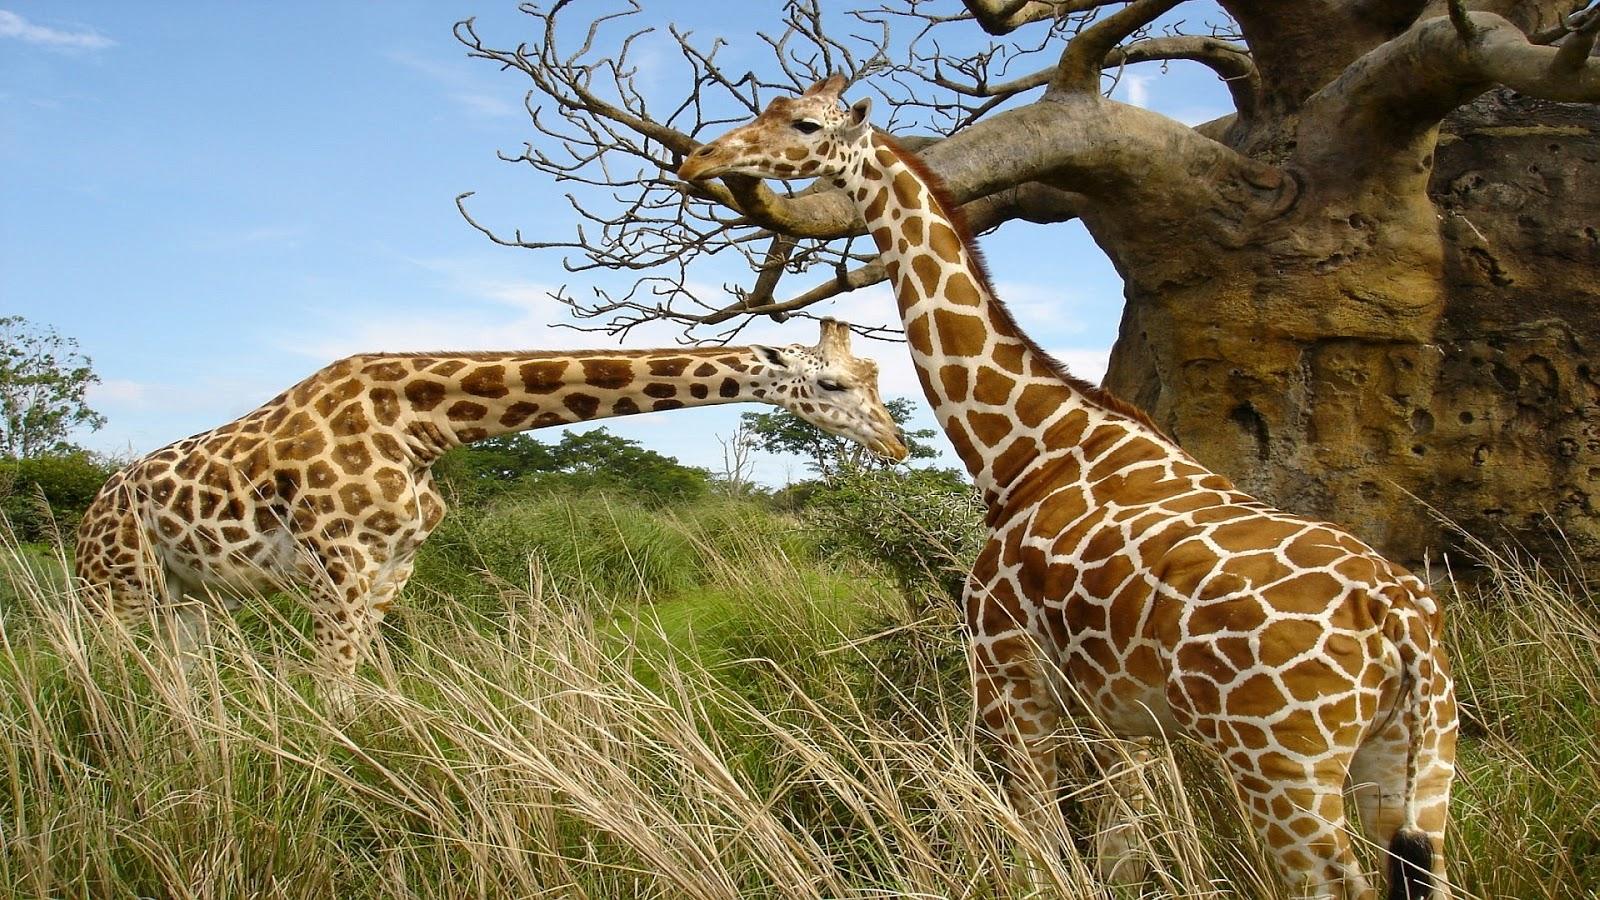 wild animal animals wallpapers animales baby salvajes nature wildlife bing giraffe amazing cool 1080p